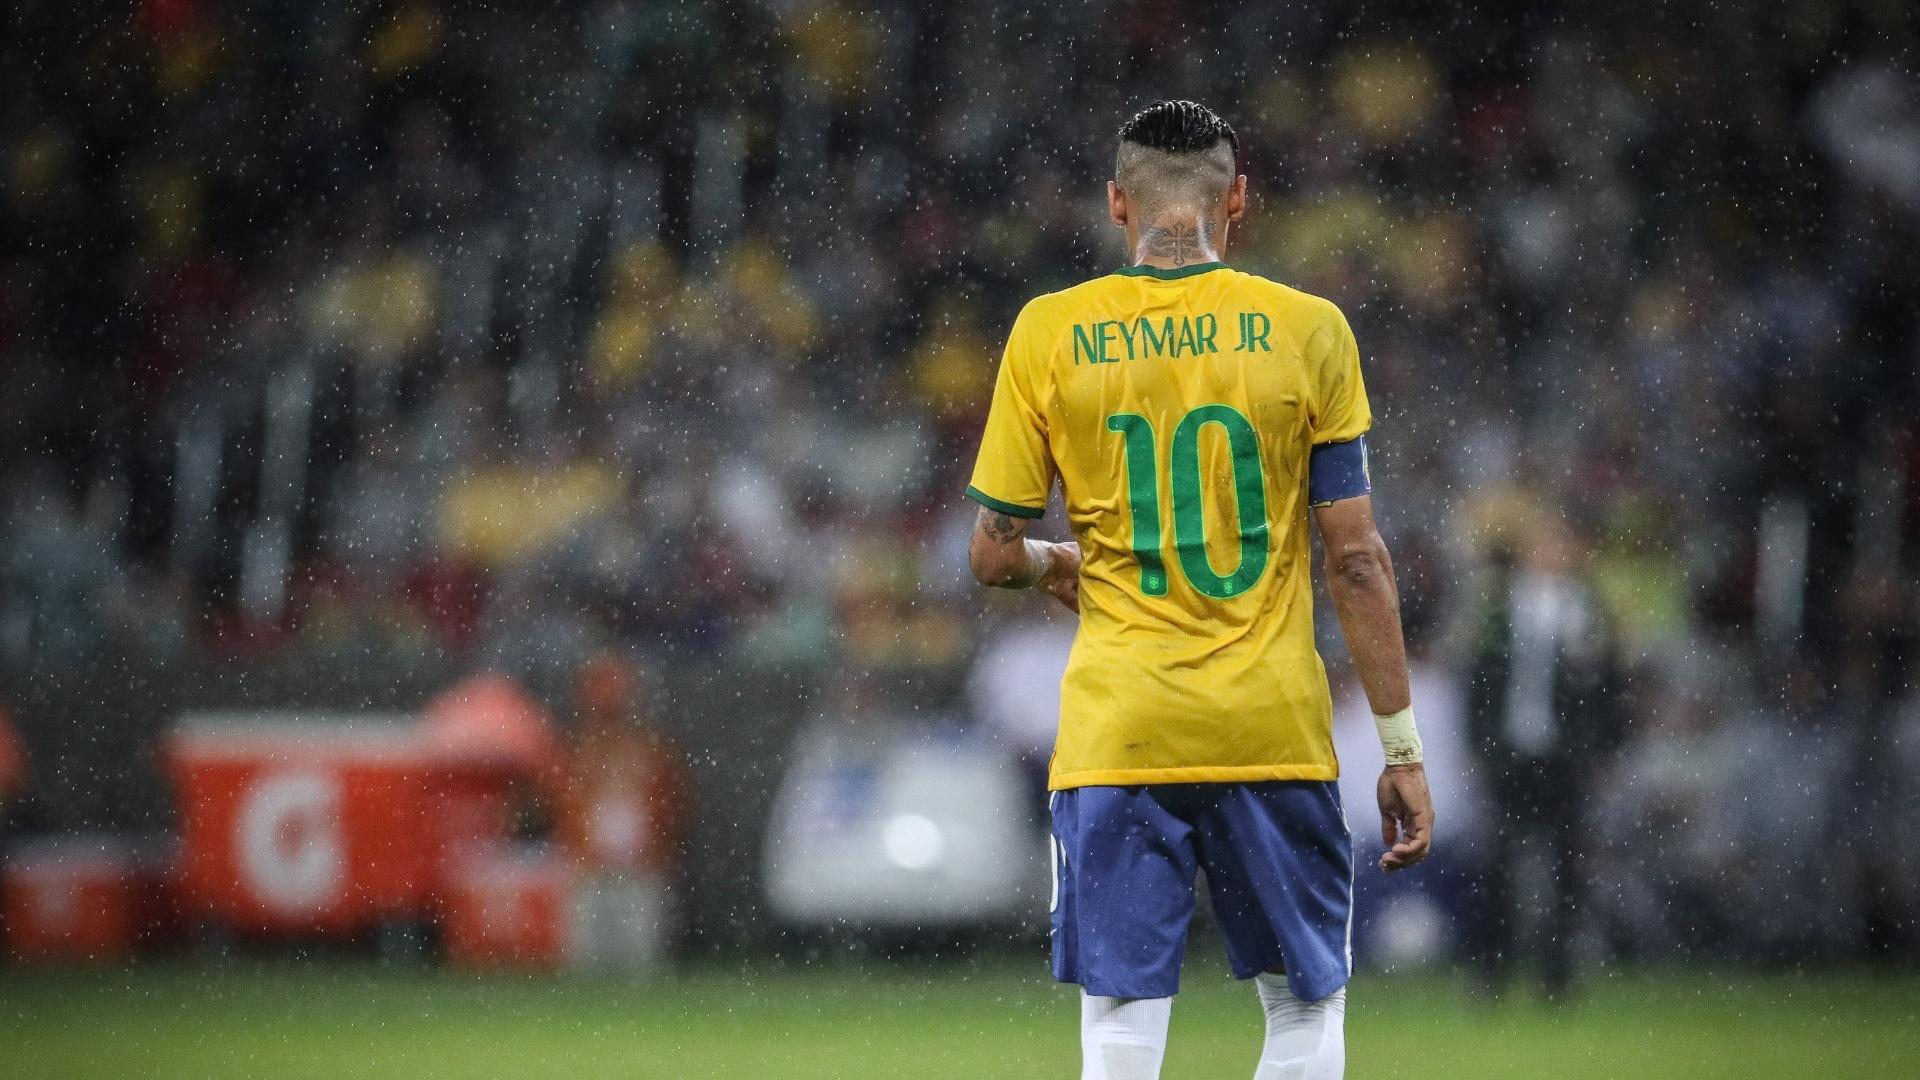 Neymar disputará os Jogos Olímpicos pela segunda vez